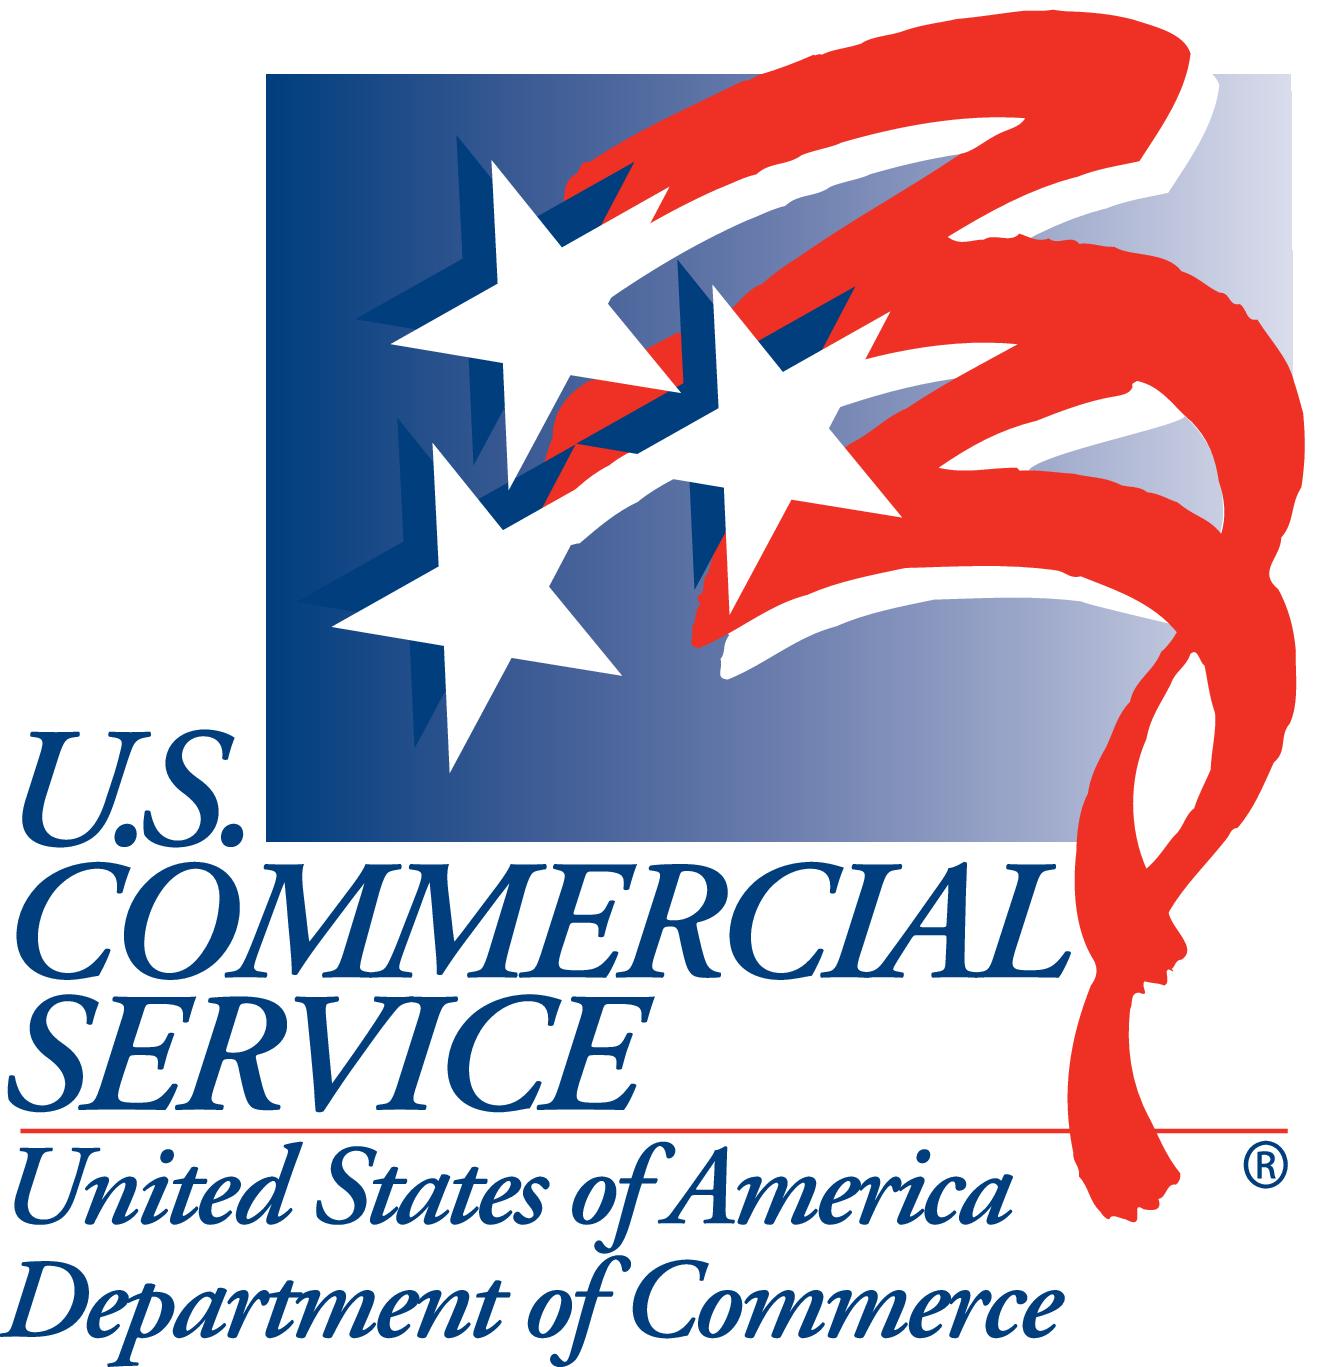 U.S. Commercial Service